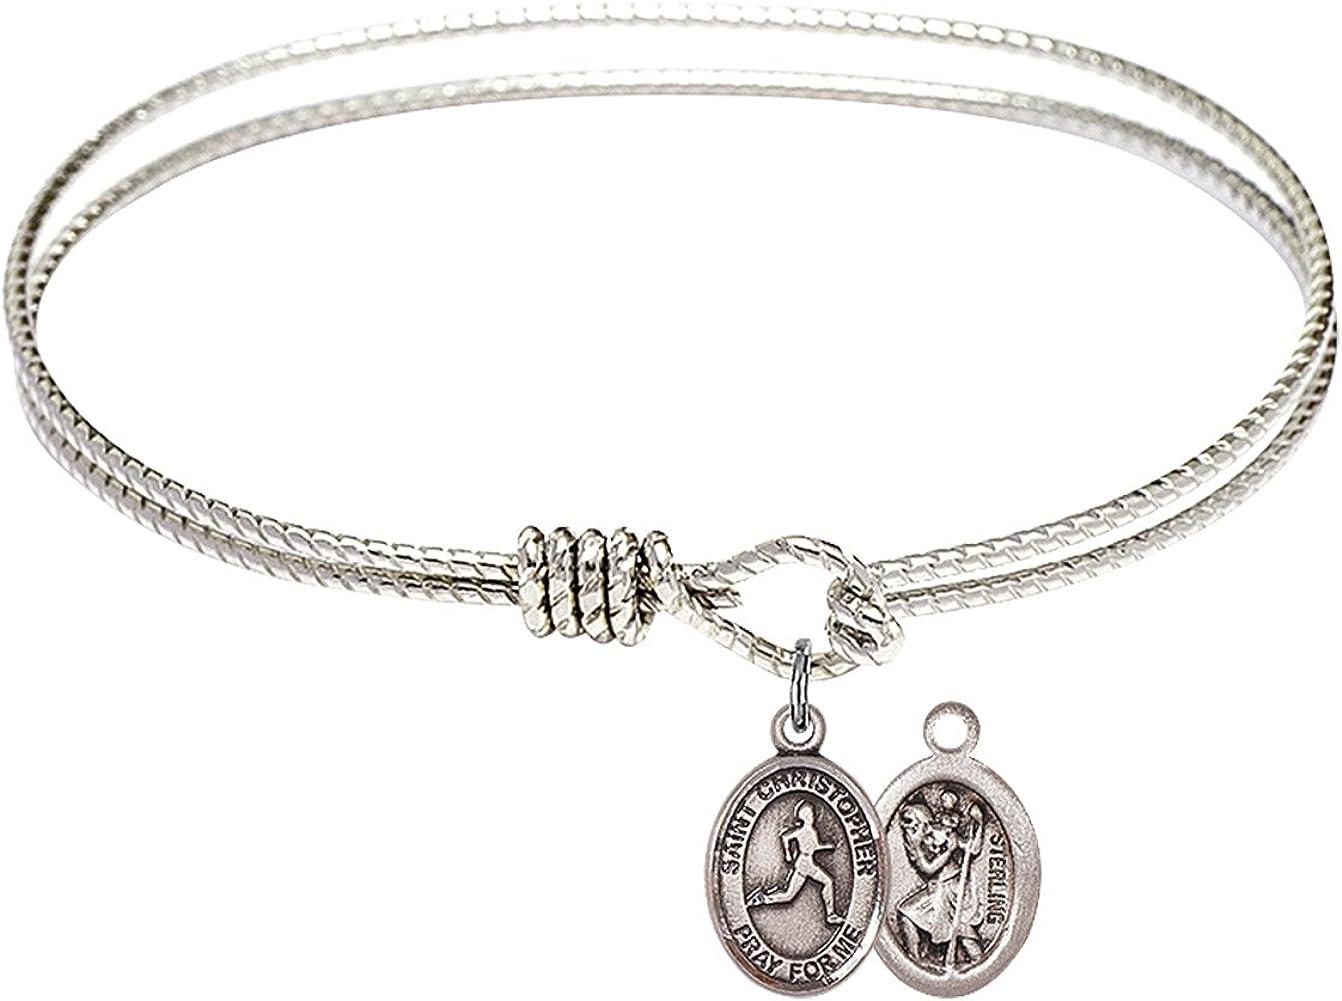 Bonyak Jewelry Round Eye Hook Bangle Bracelet w//St Christopher in Sterling Silver